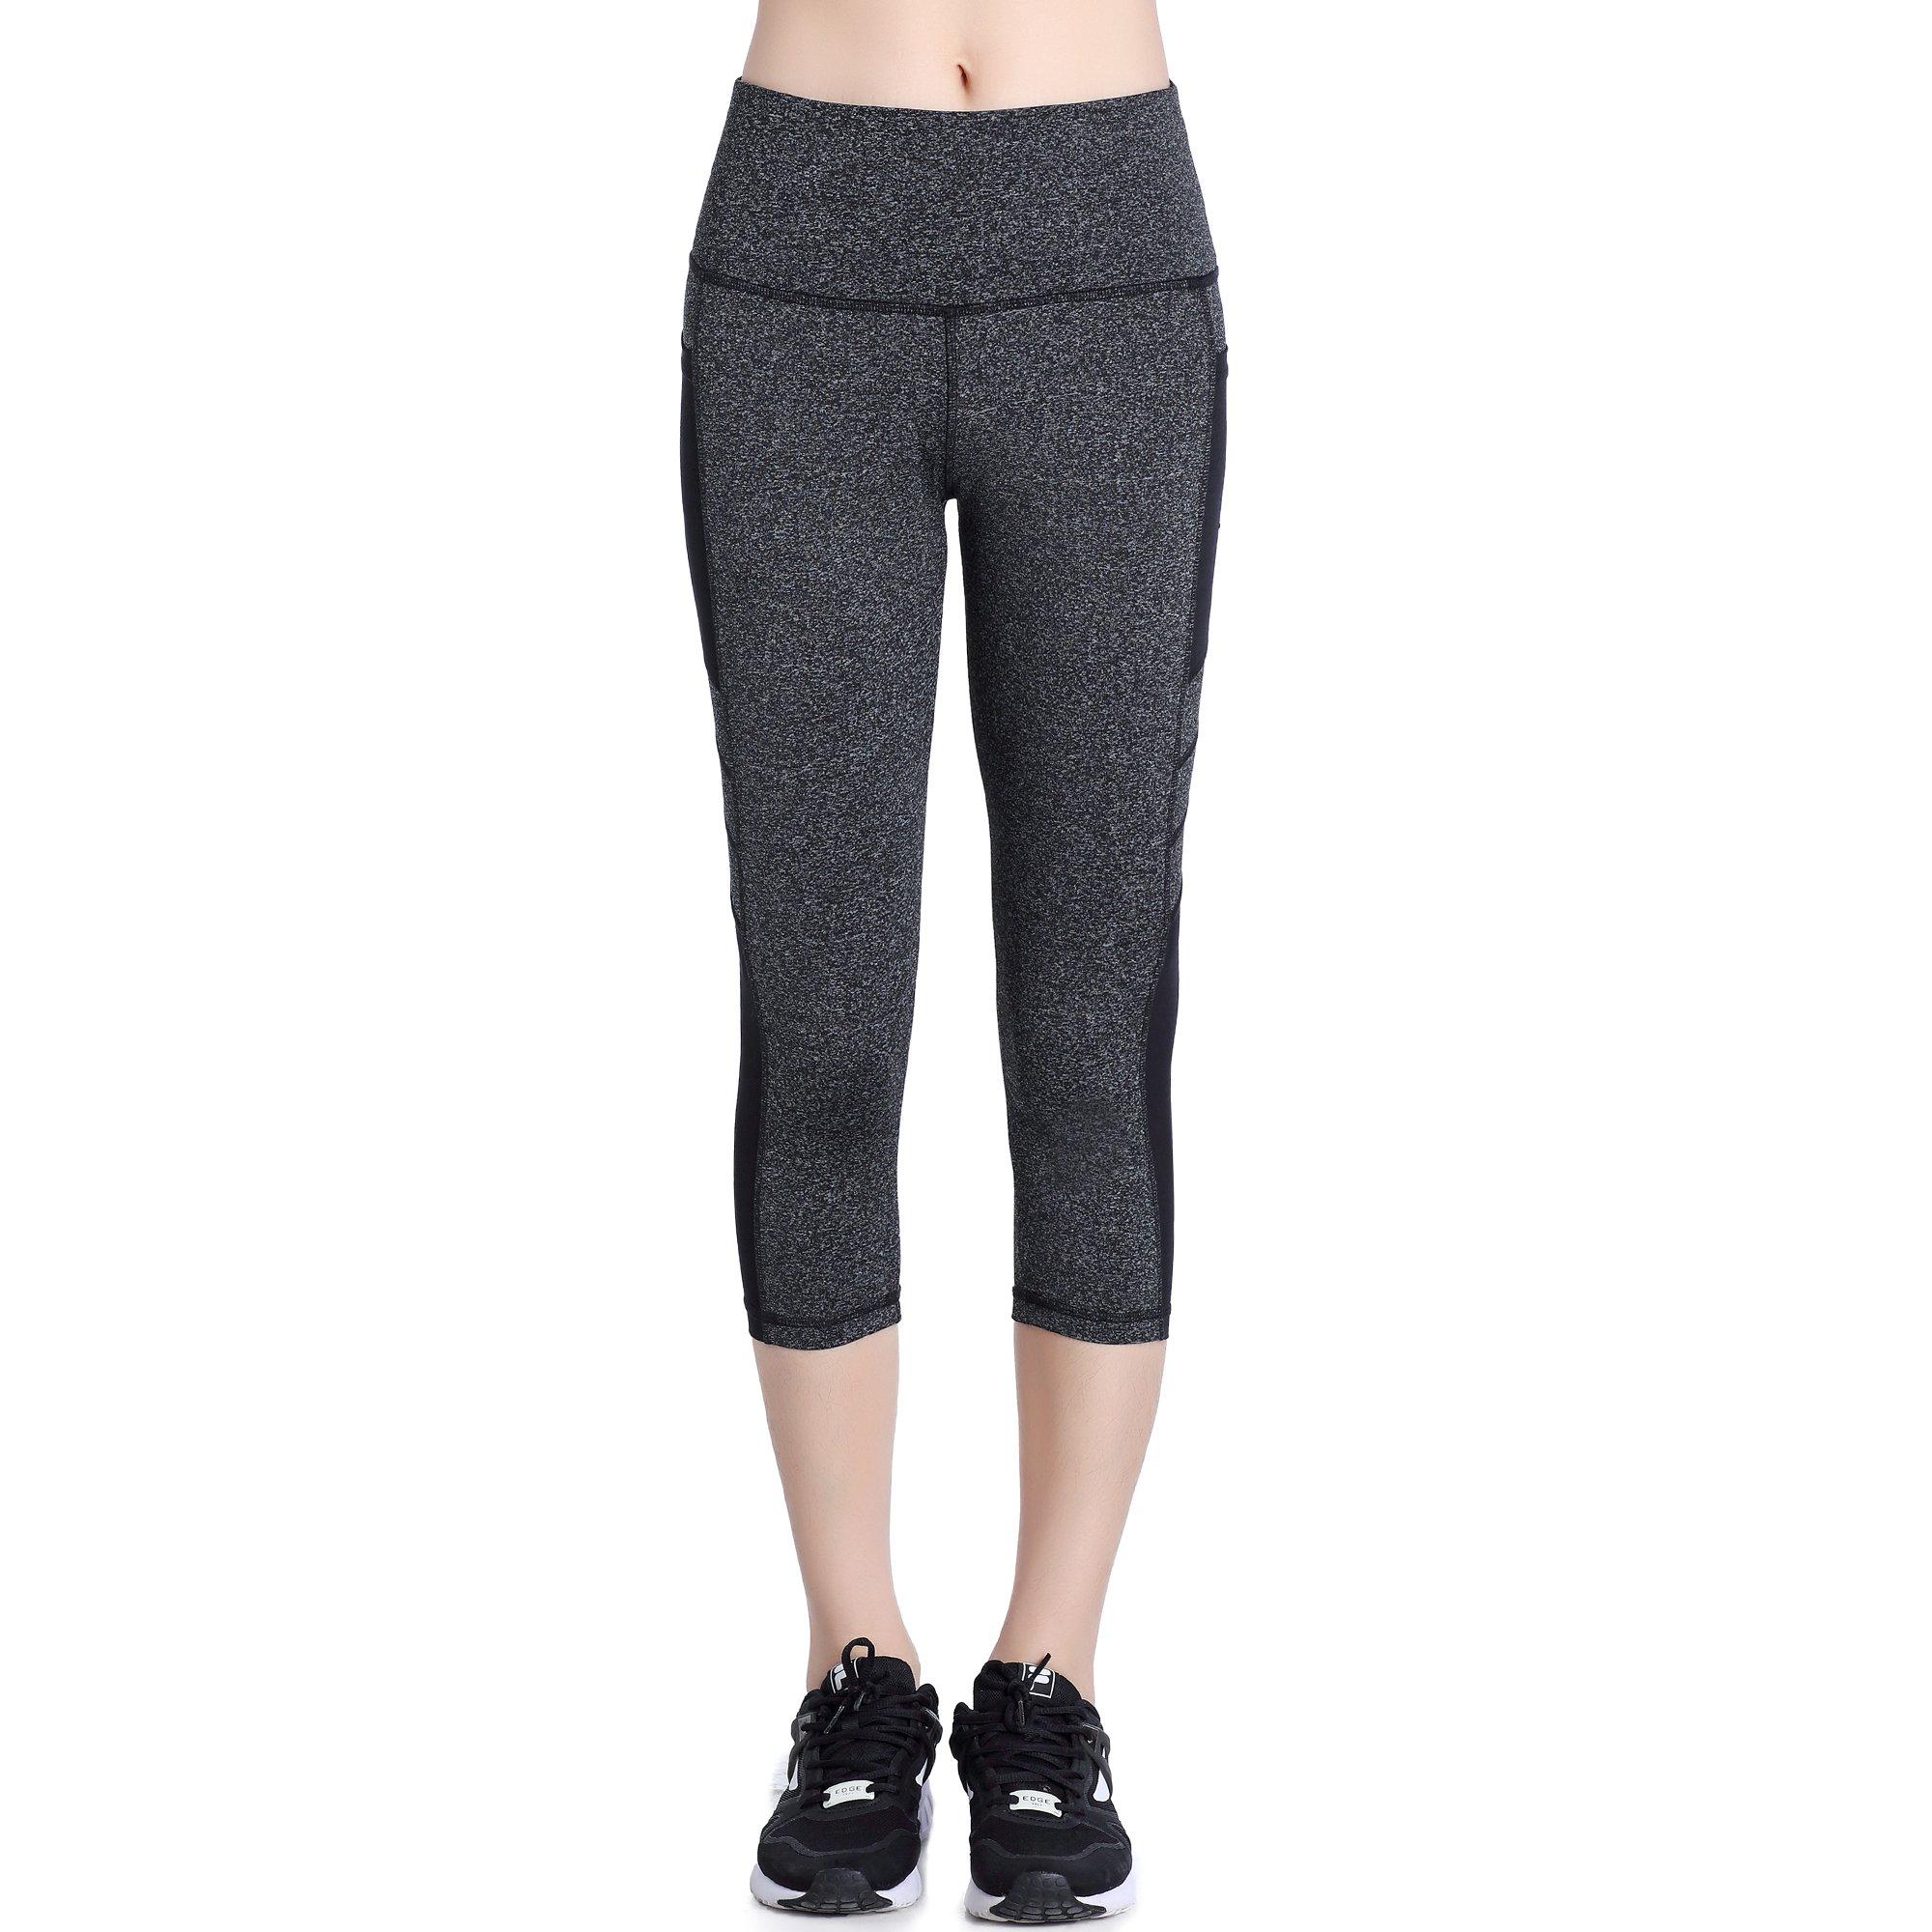 Picotee Women's Yoga Capri Pants Workout Running Pants Leggings High Waist with Pocket (L, Grey)